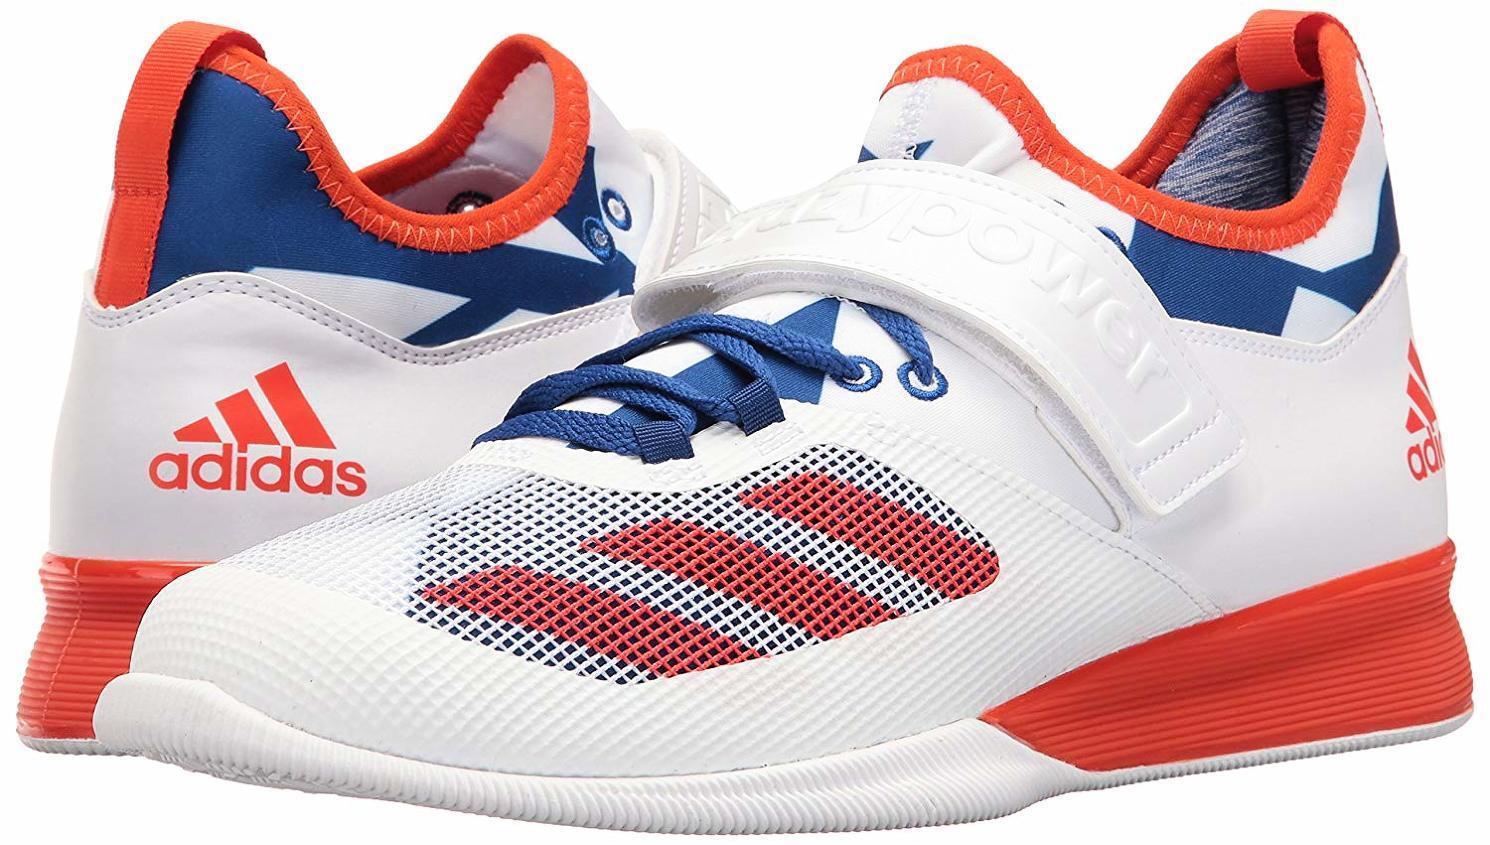 Adidas Performance Men's Crazy Power Cross-Trainer shoes Size-6.5